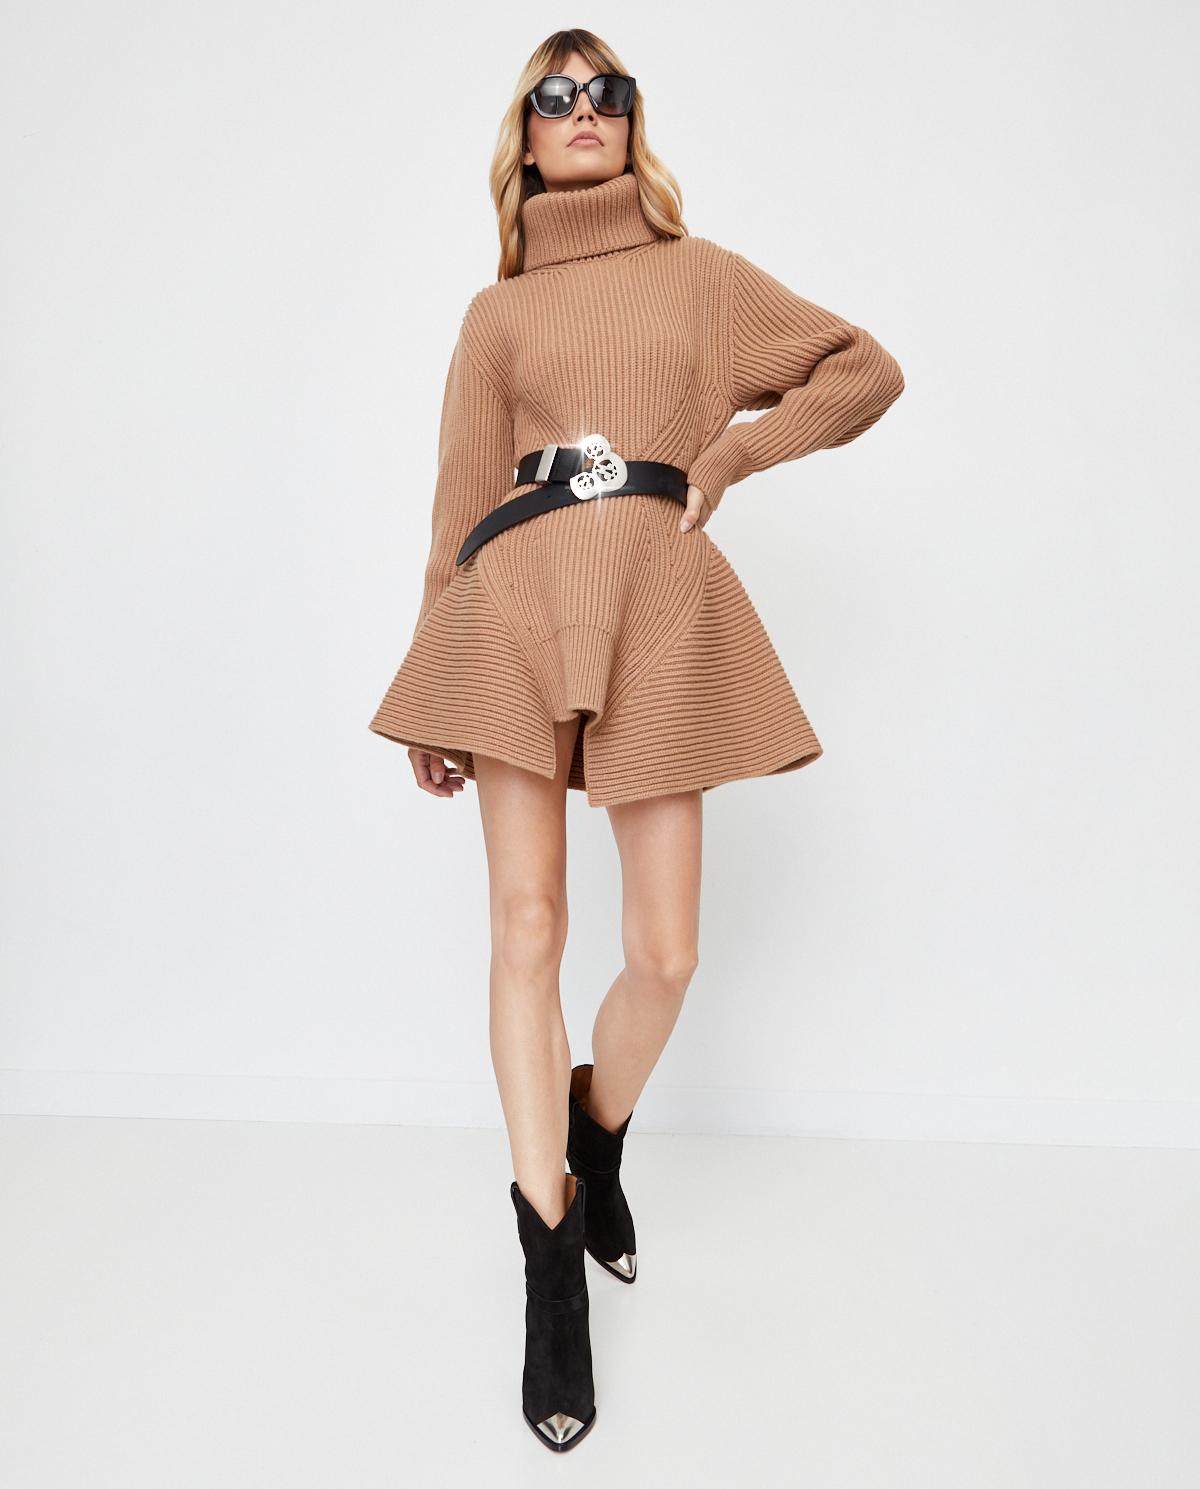 Wełniana sukienka z golfem Alexander McQueen 633688 Q1AQ1 9047